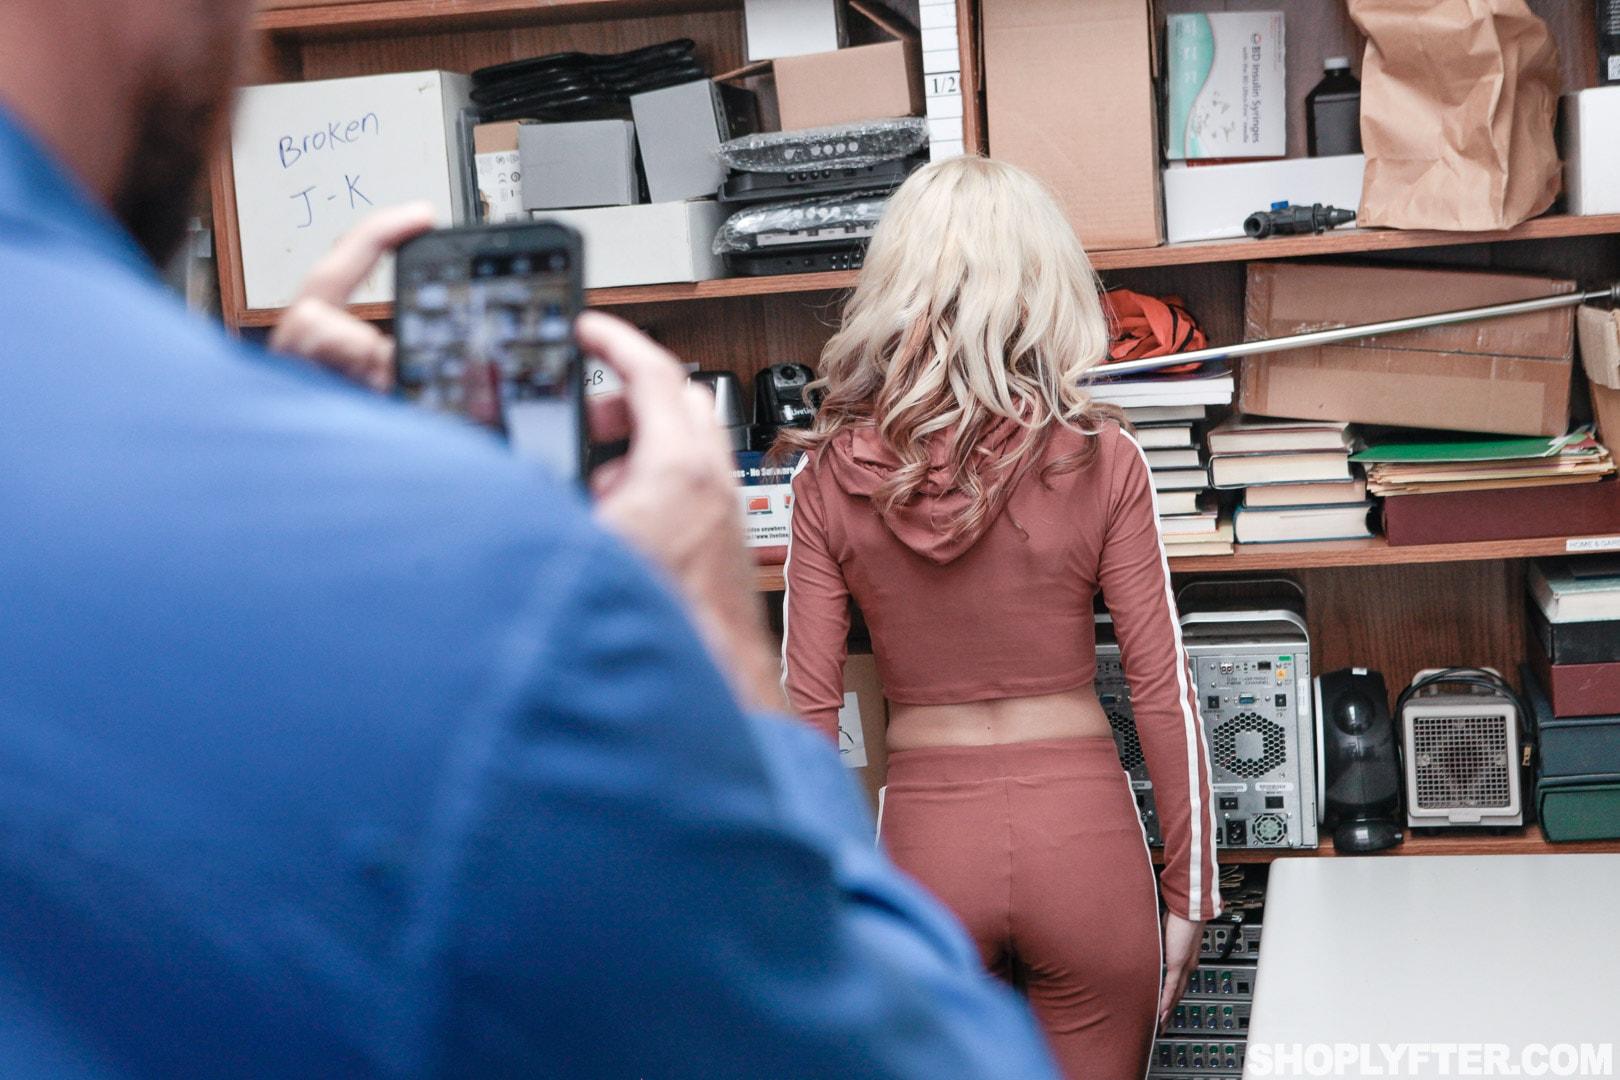 Team Skeet 'Case No. 111392' starring Kiara Cole (Photo 16)